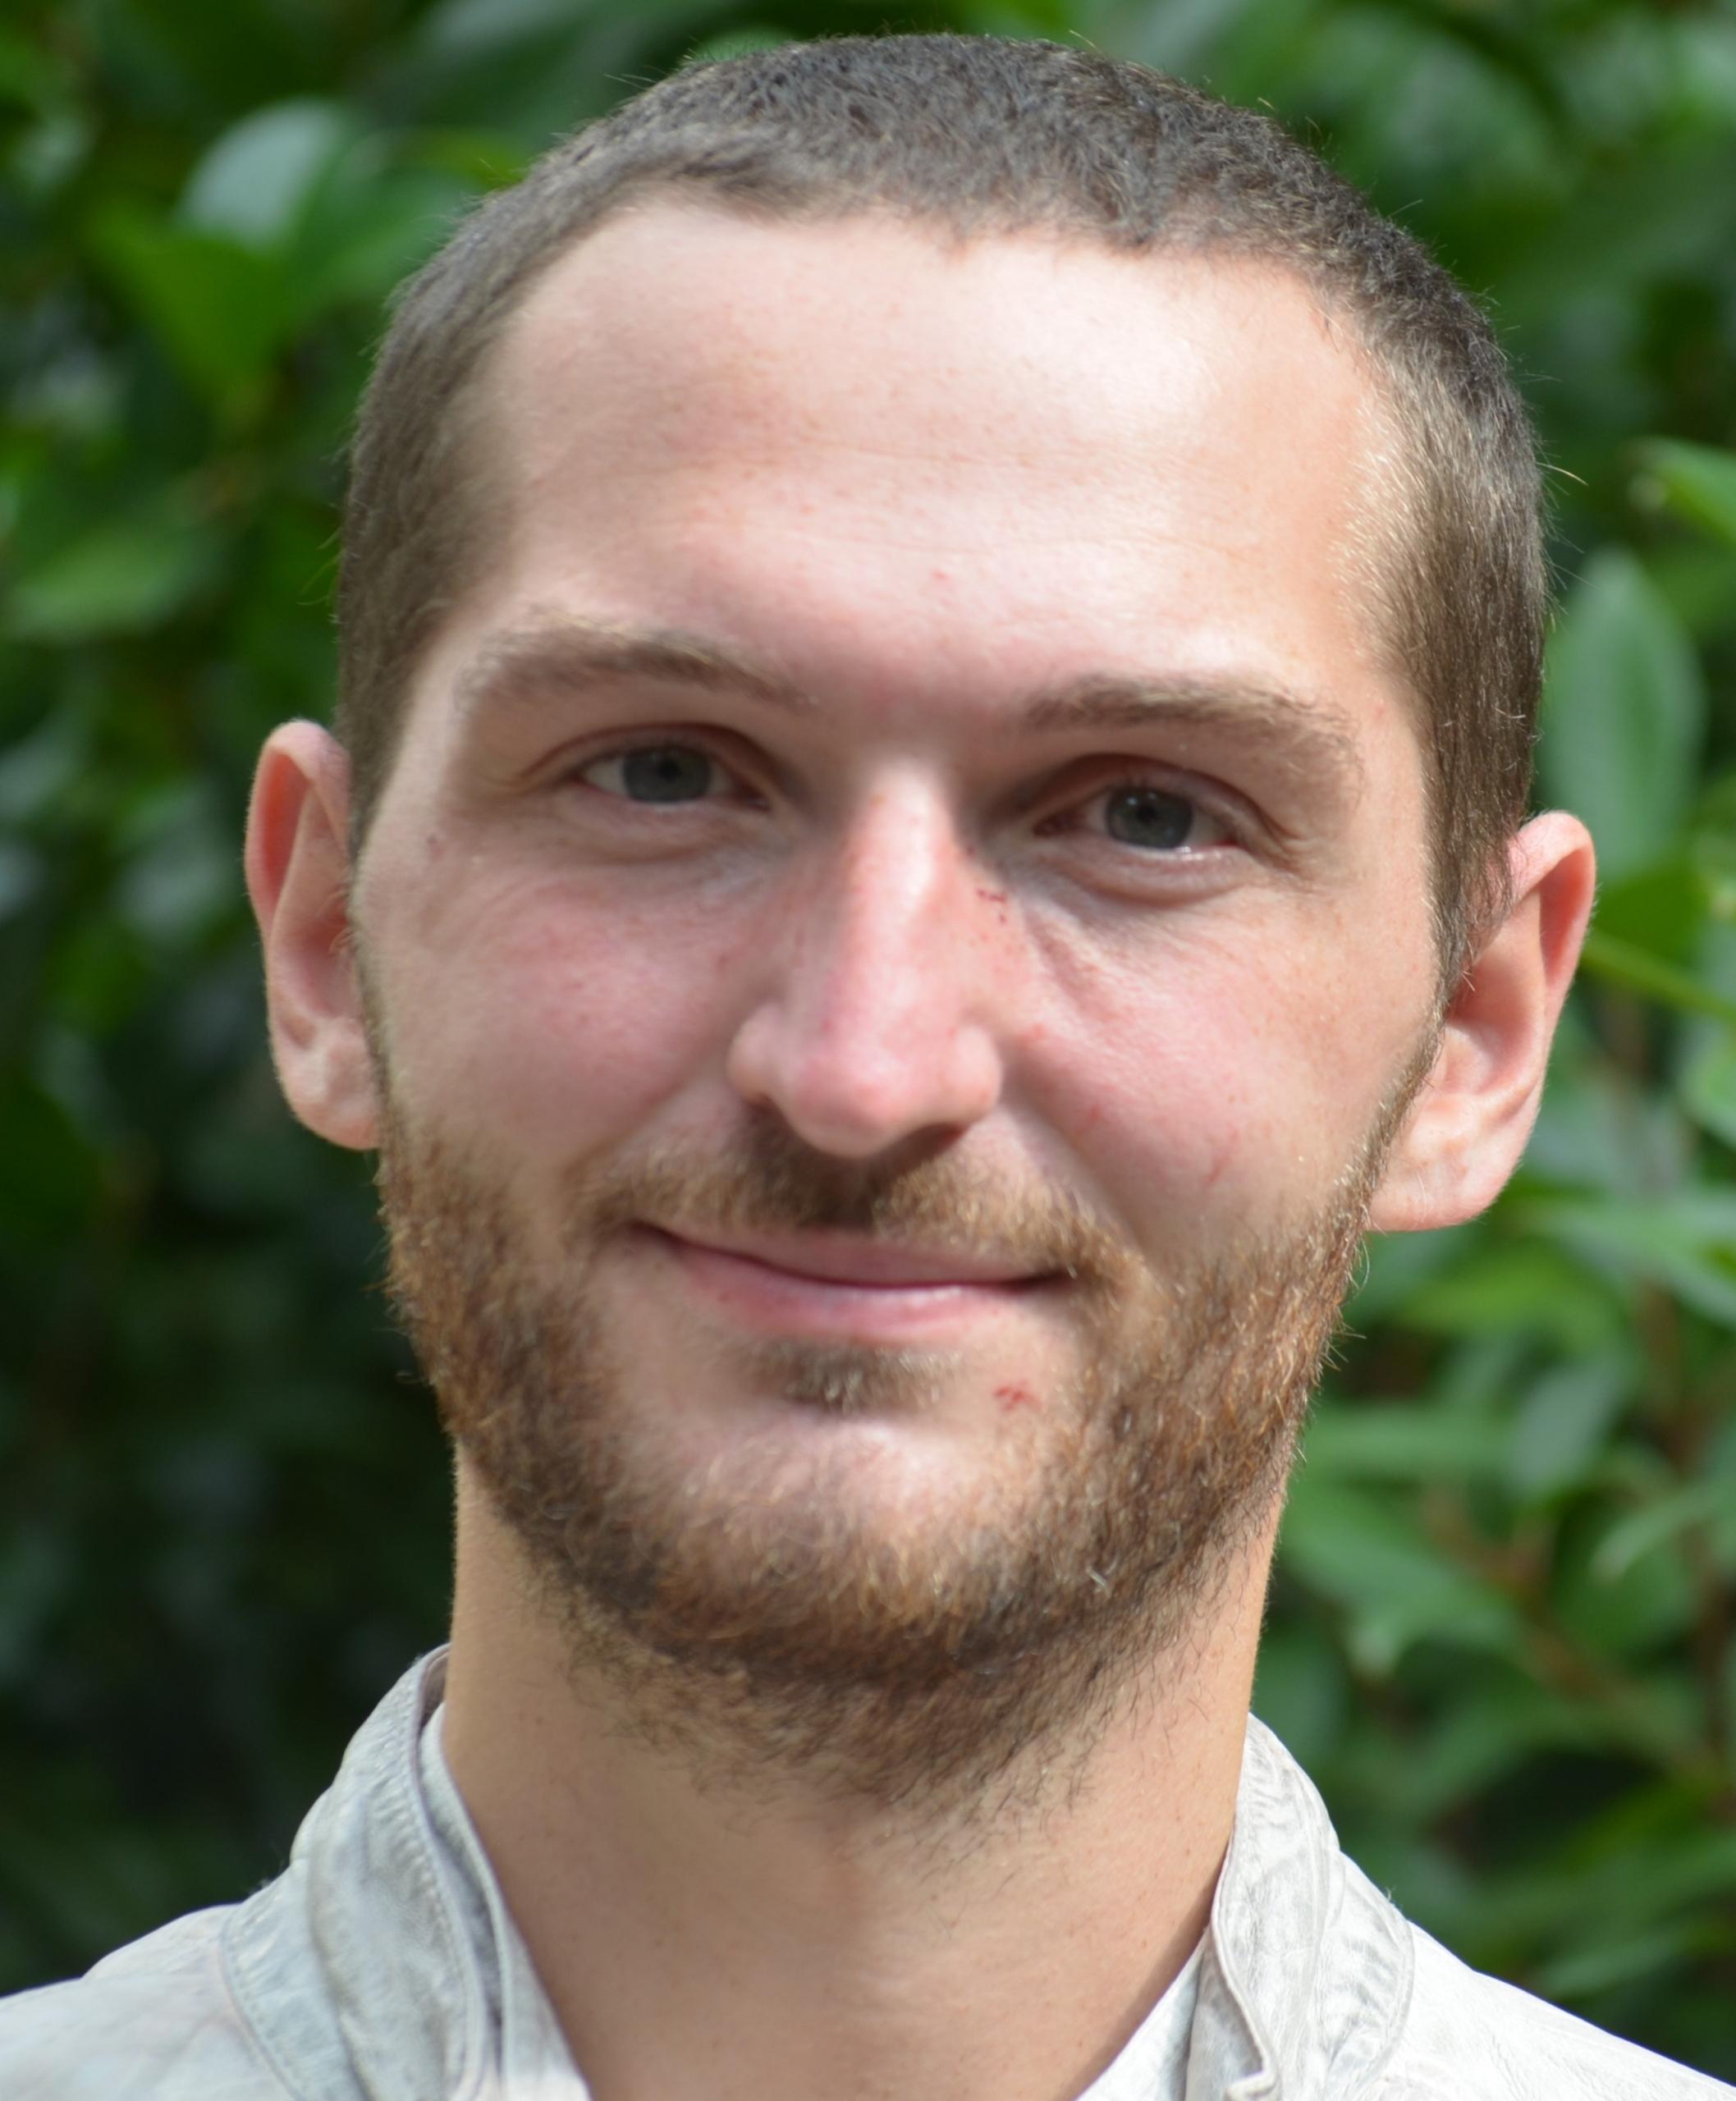 Michael Grillenberger